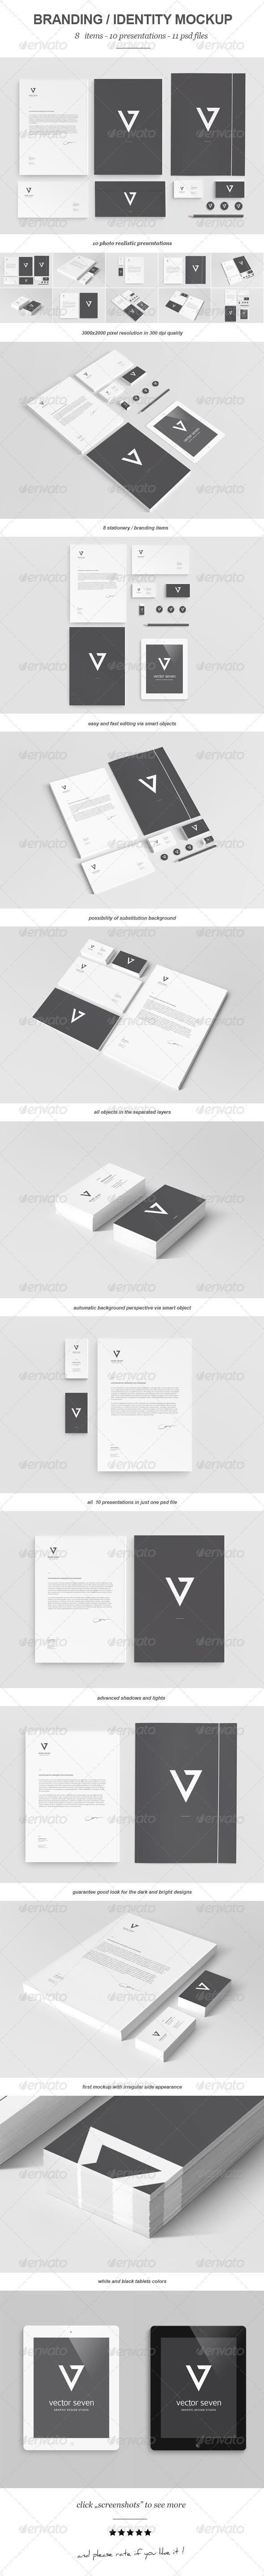 GraphicRiver Branding Identity Mock-up II 3051325